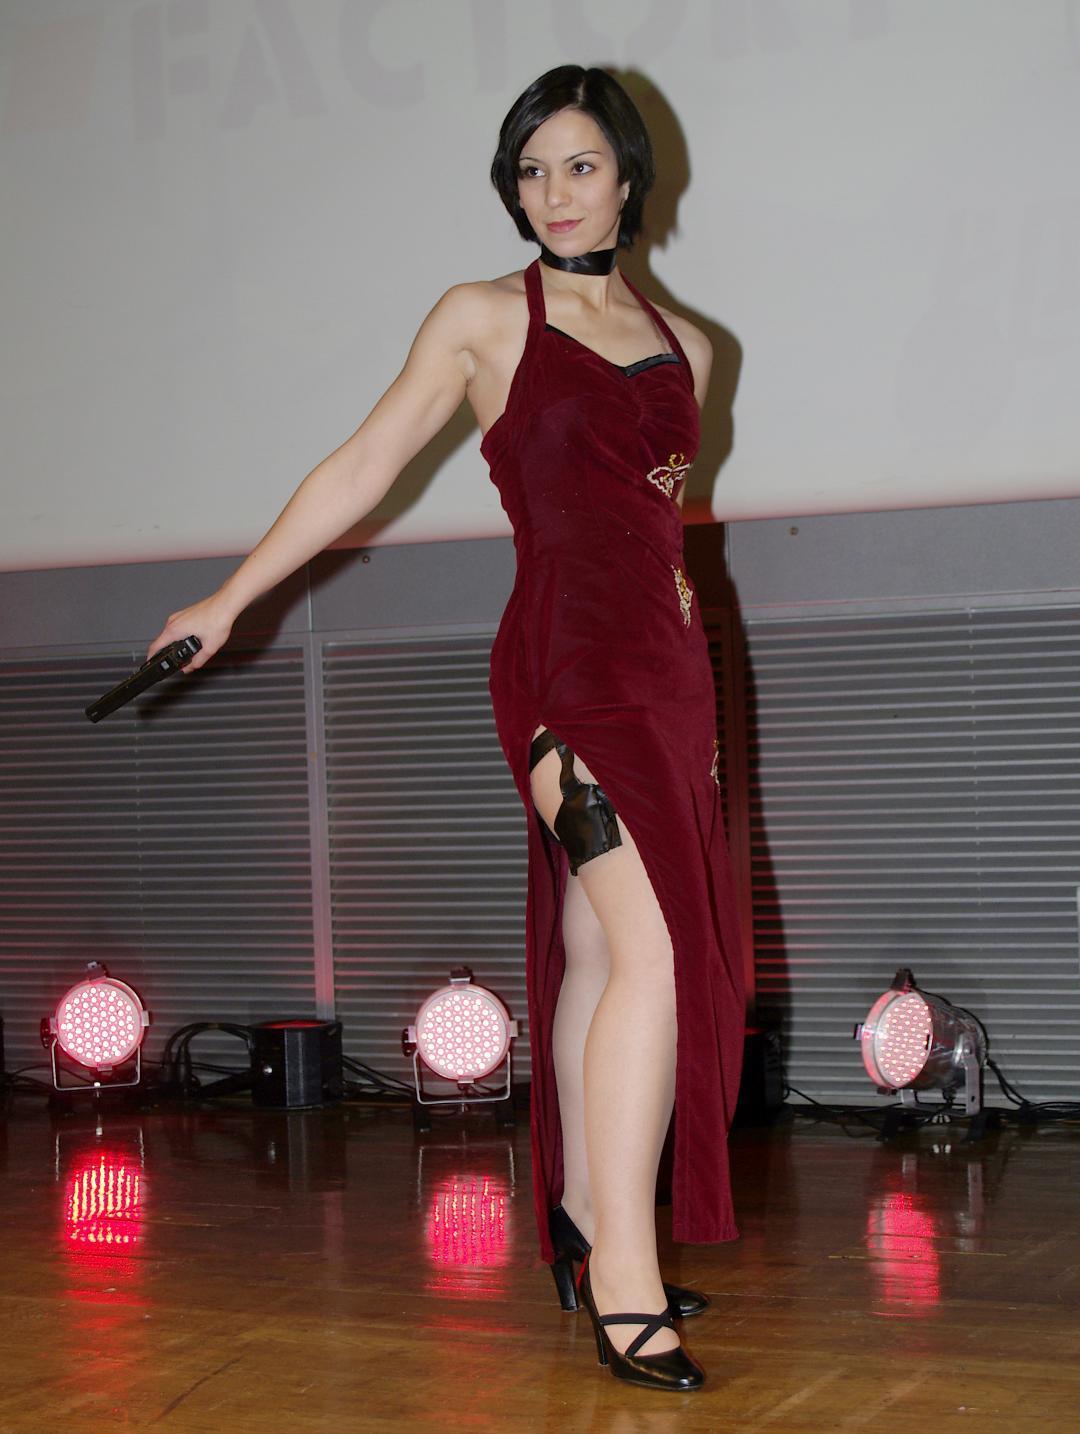 Ada Wong Resident Evil cosplay girl